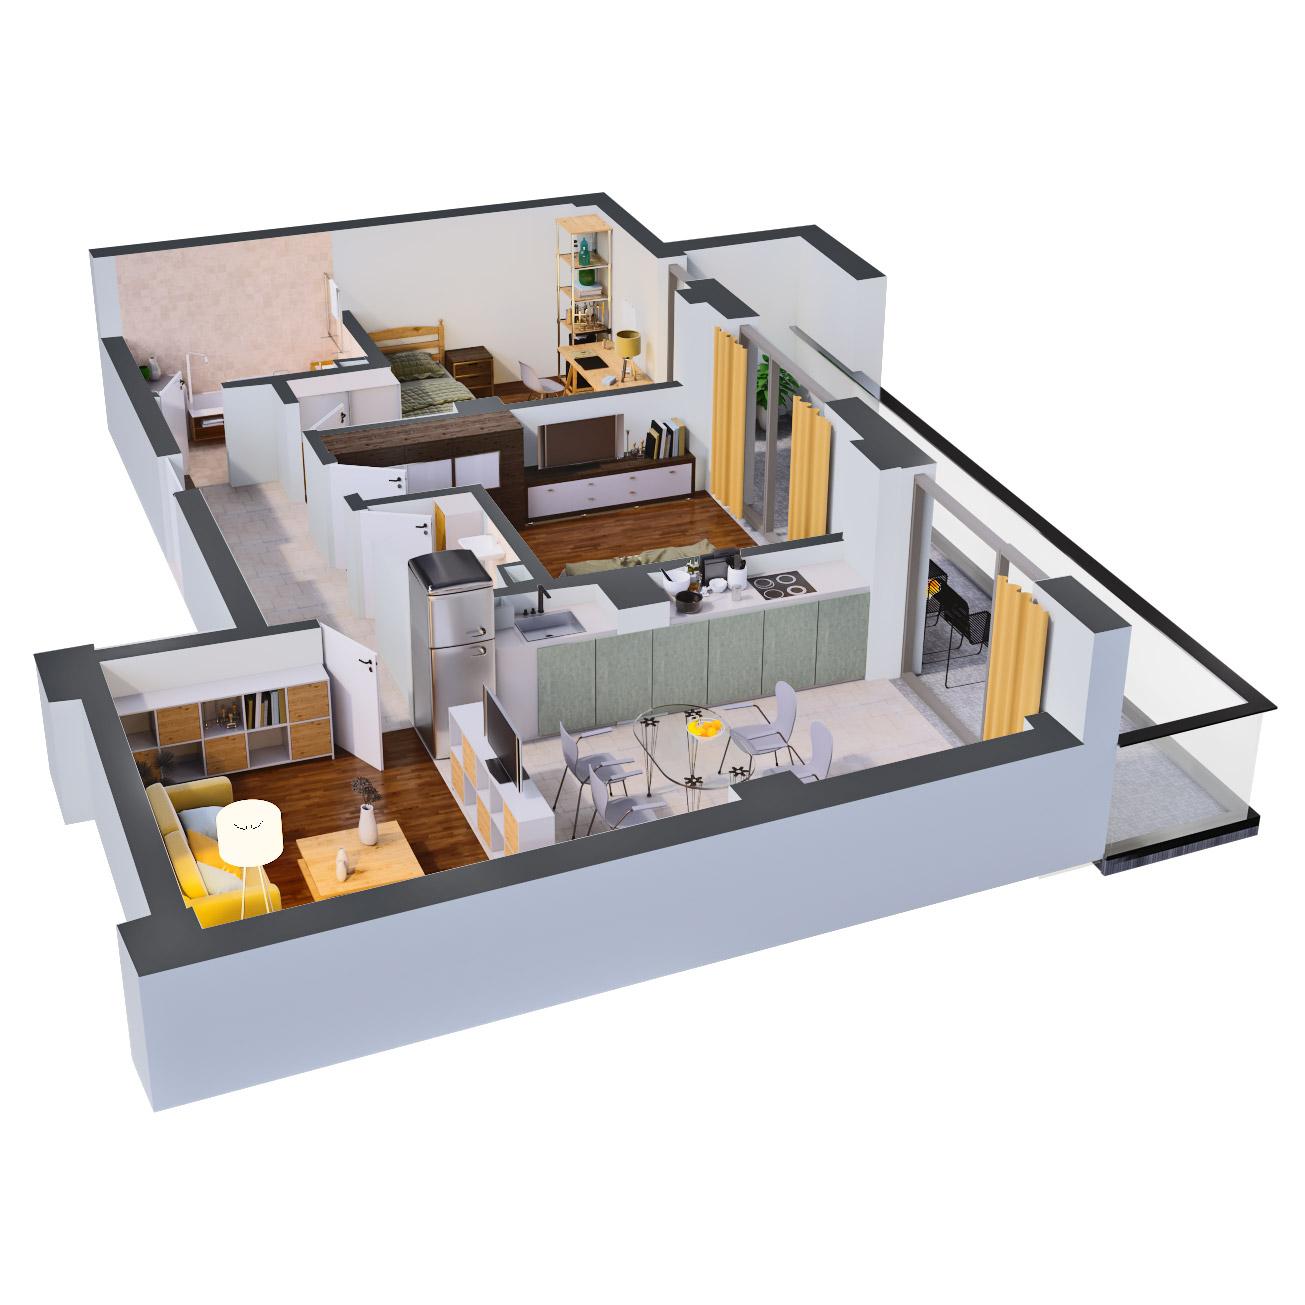 Apartament 3 camere de vanzare Bucuresti - Catedral Residence - Marriott, Piata Unirii, 13 Septembrie, Izvor - Tip 4 - T2 - C